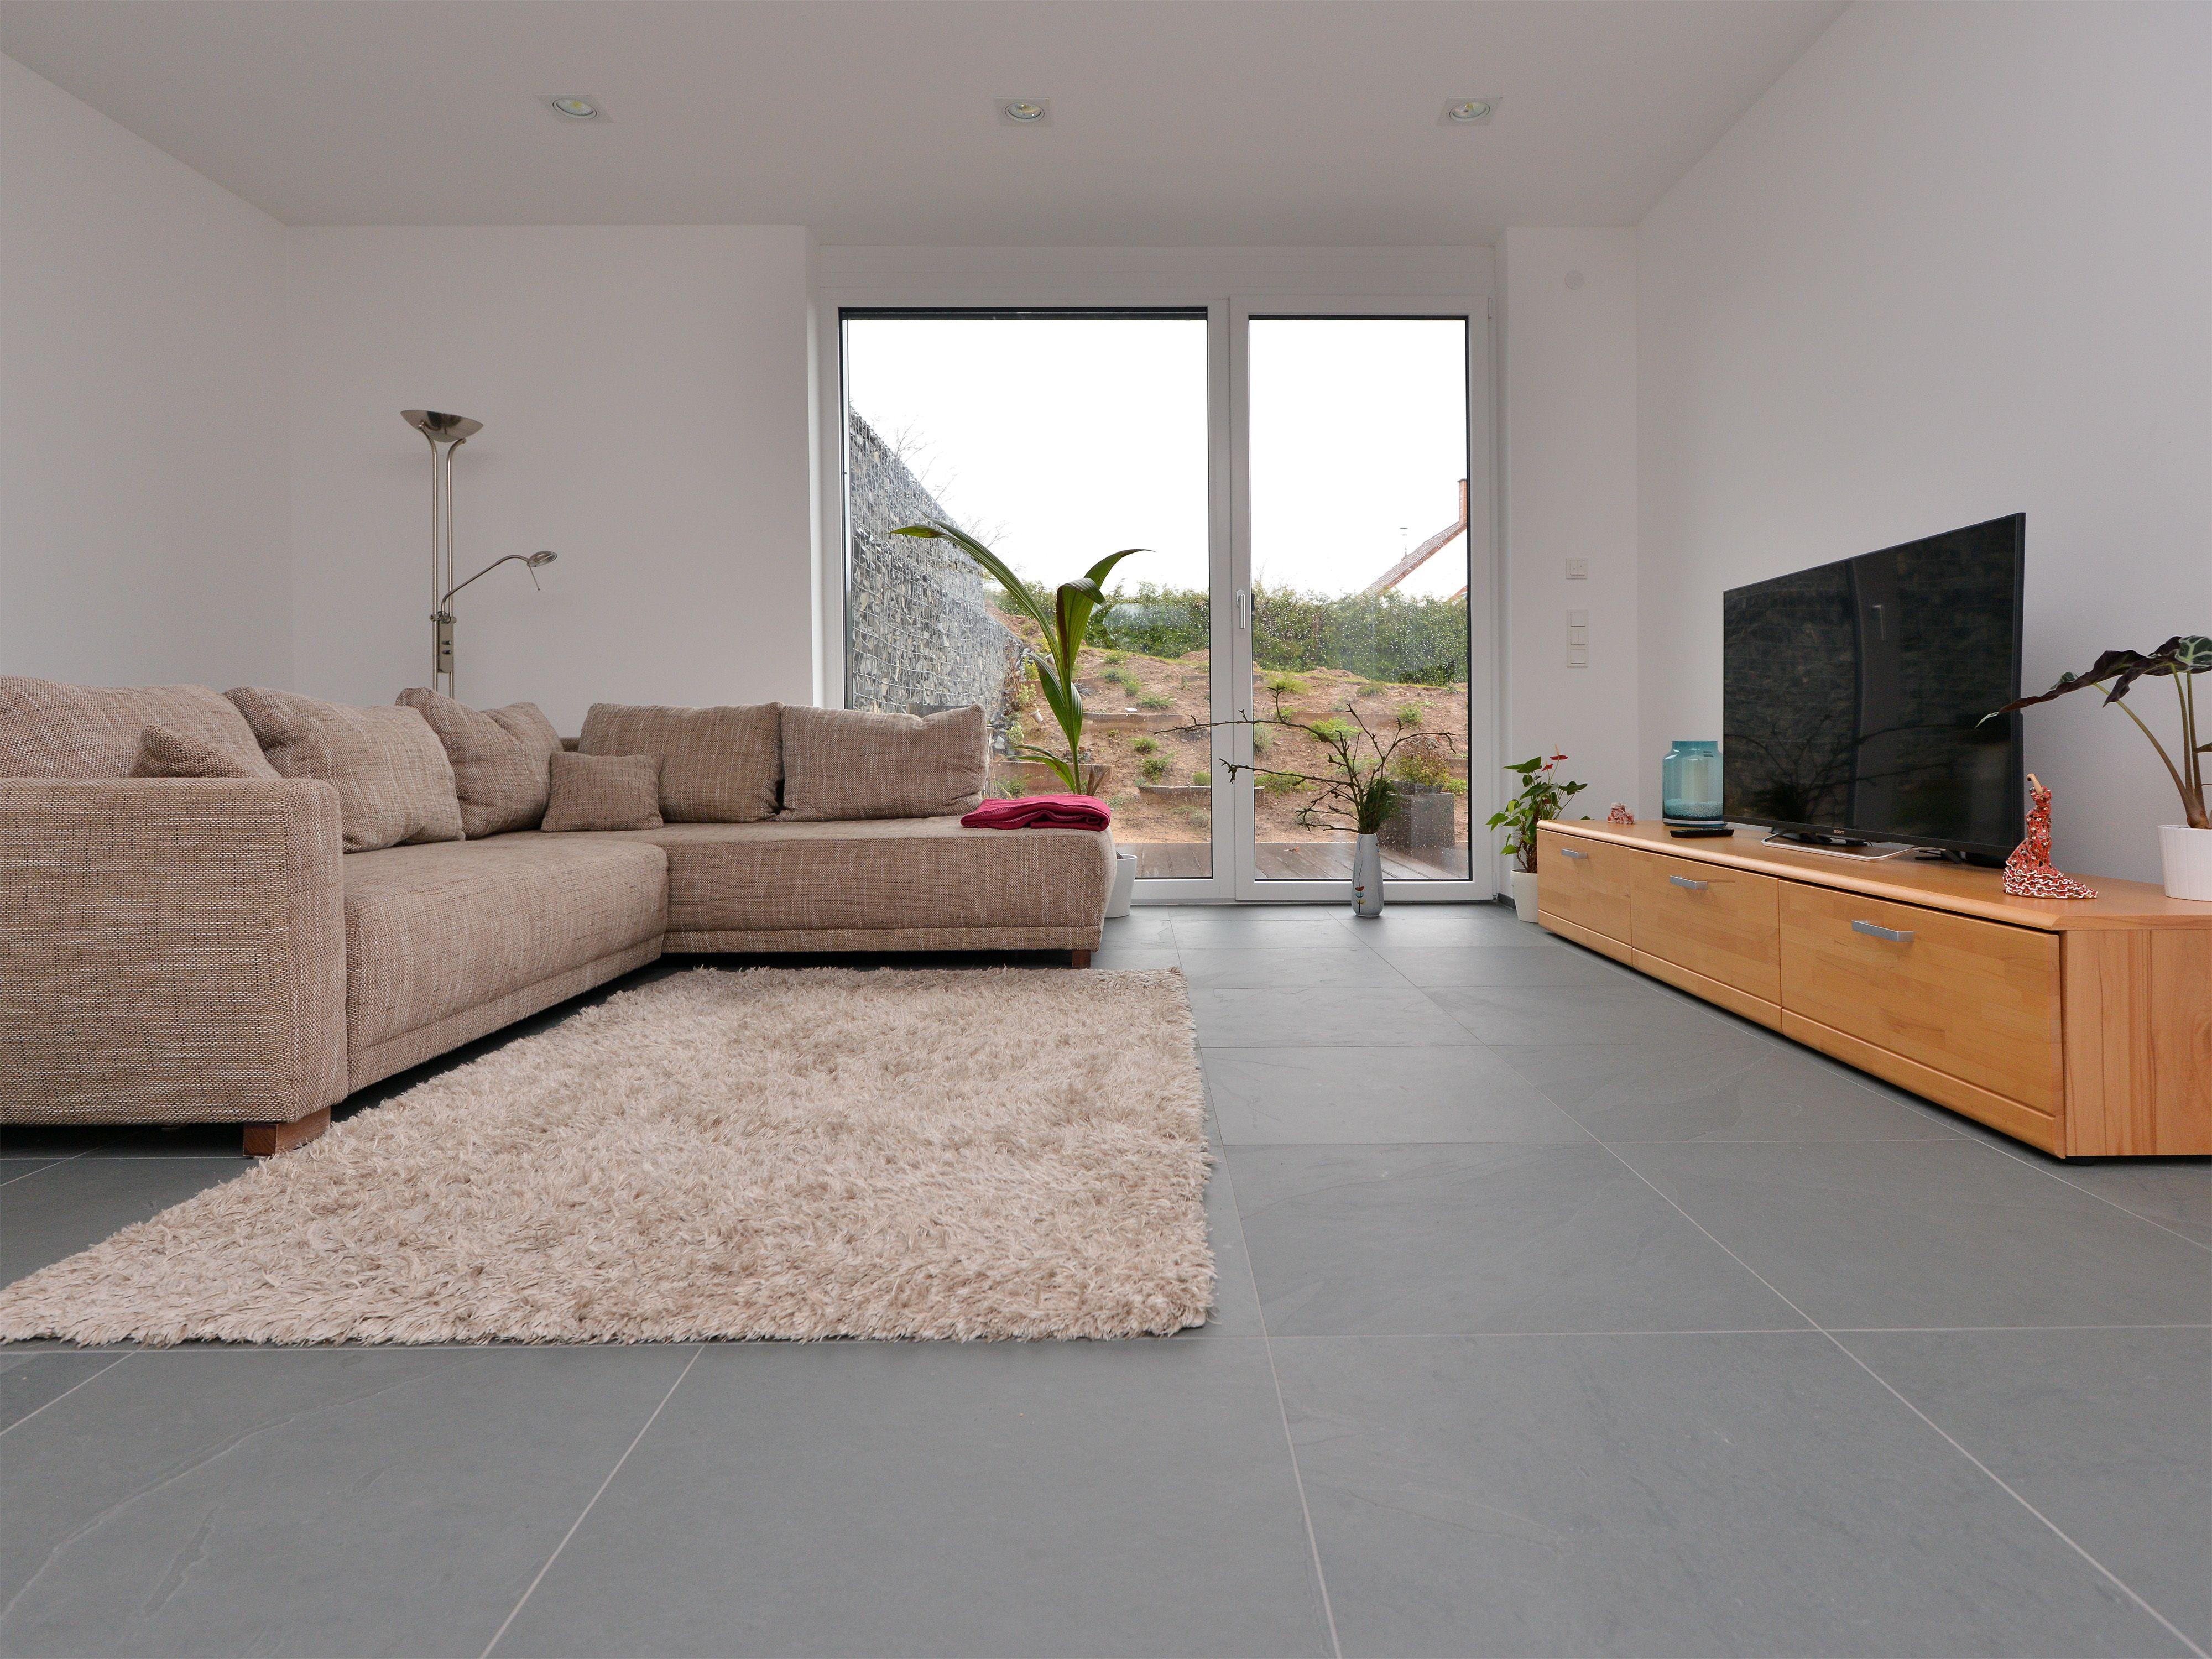 Carrelage Grey Slate En Ardoise Stonenaturelle Le Choix De L - Carrelage ardoise